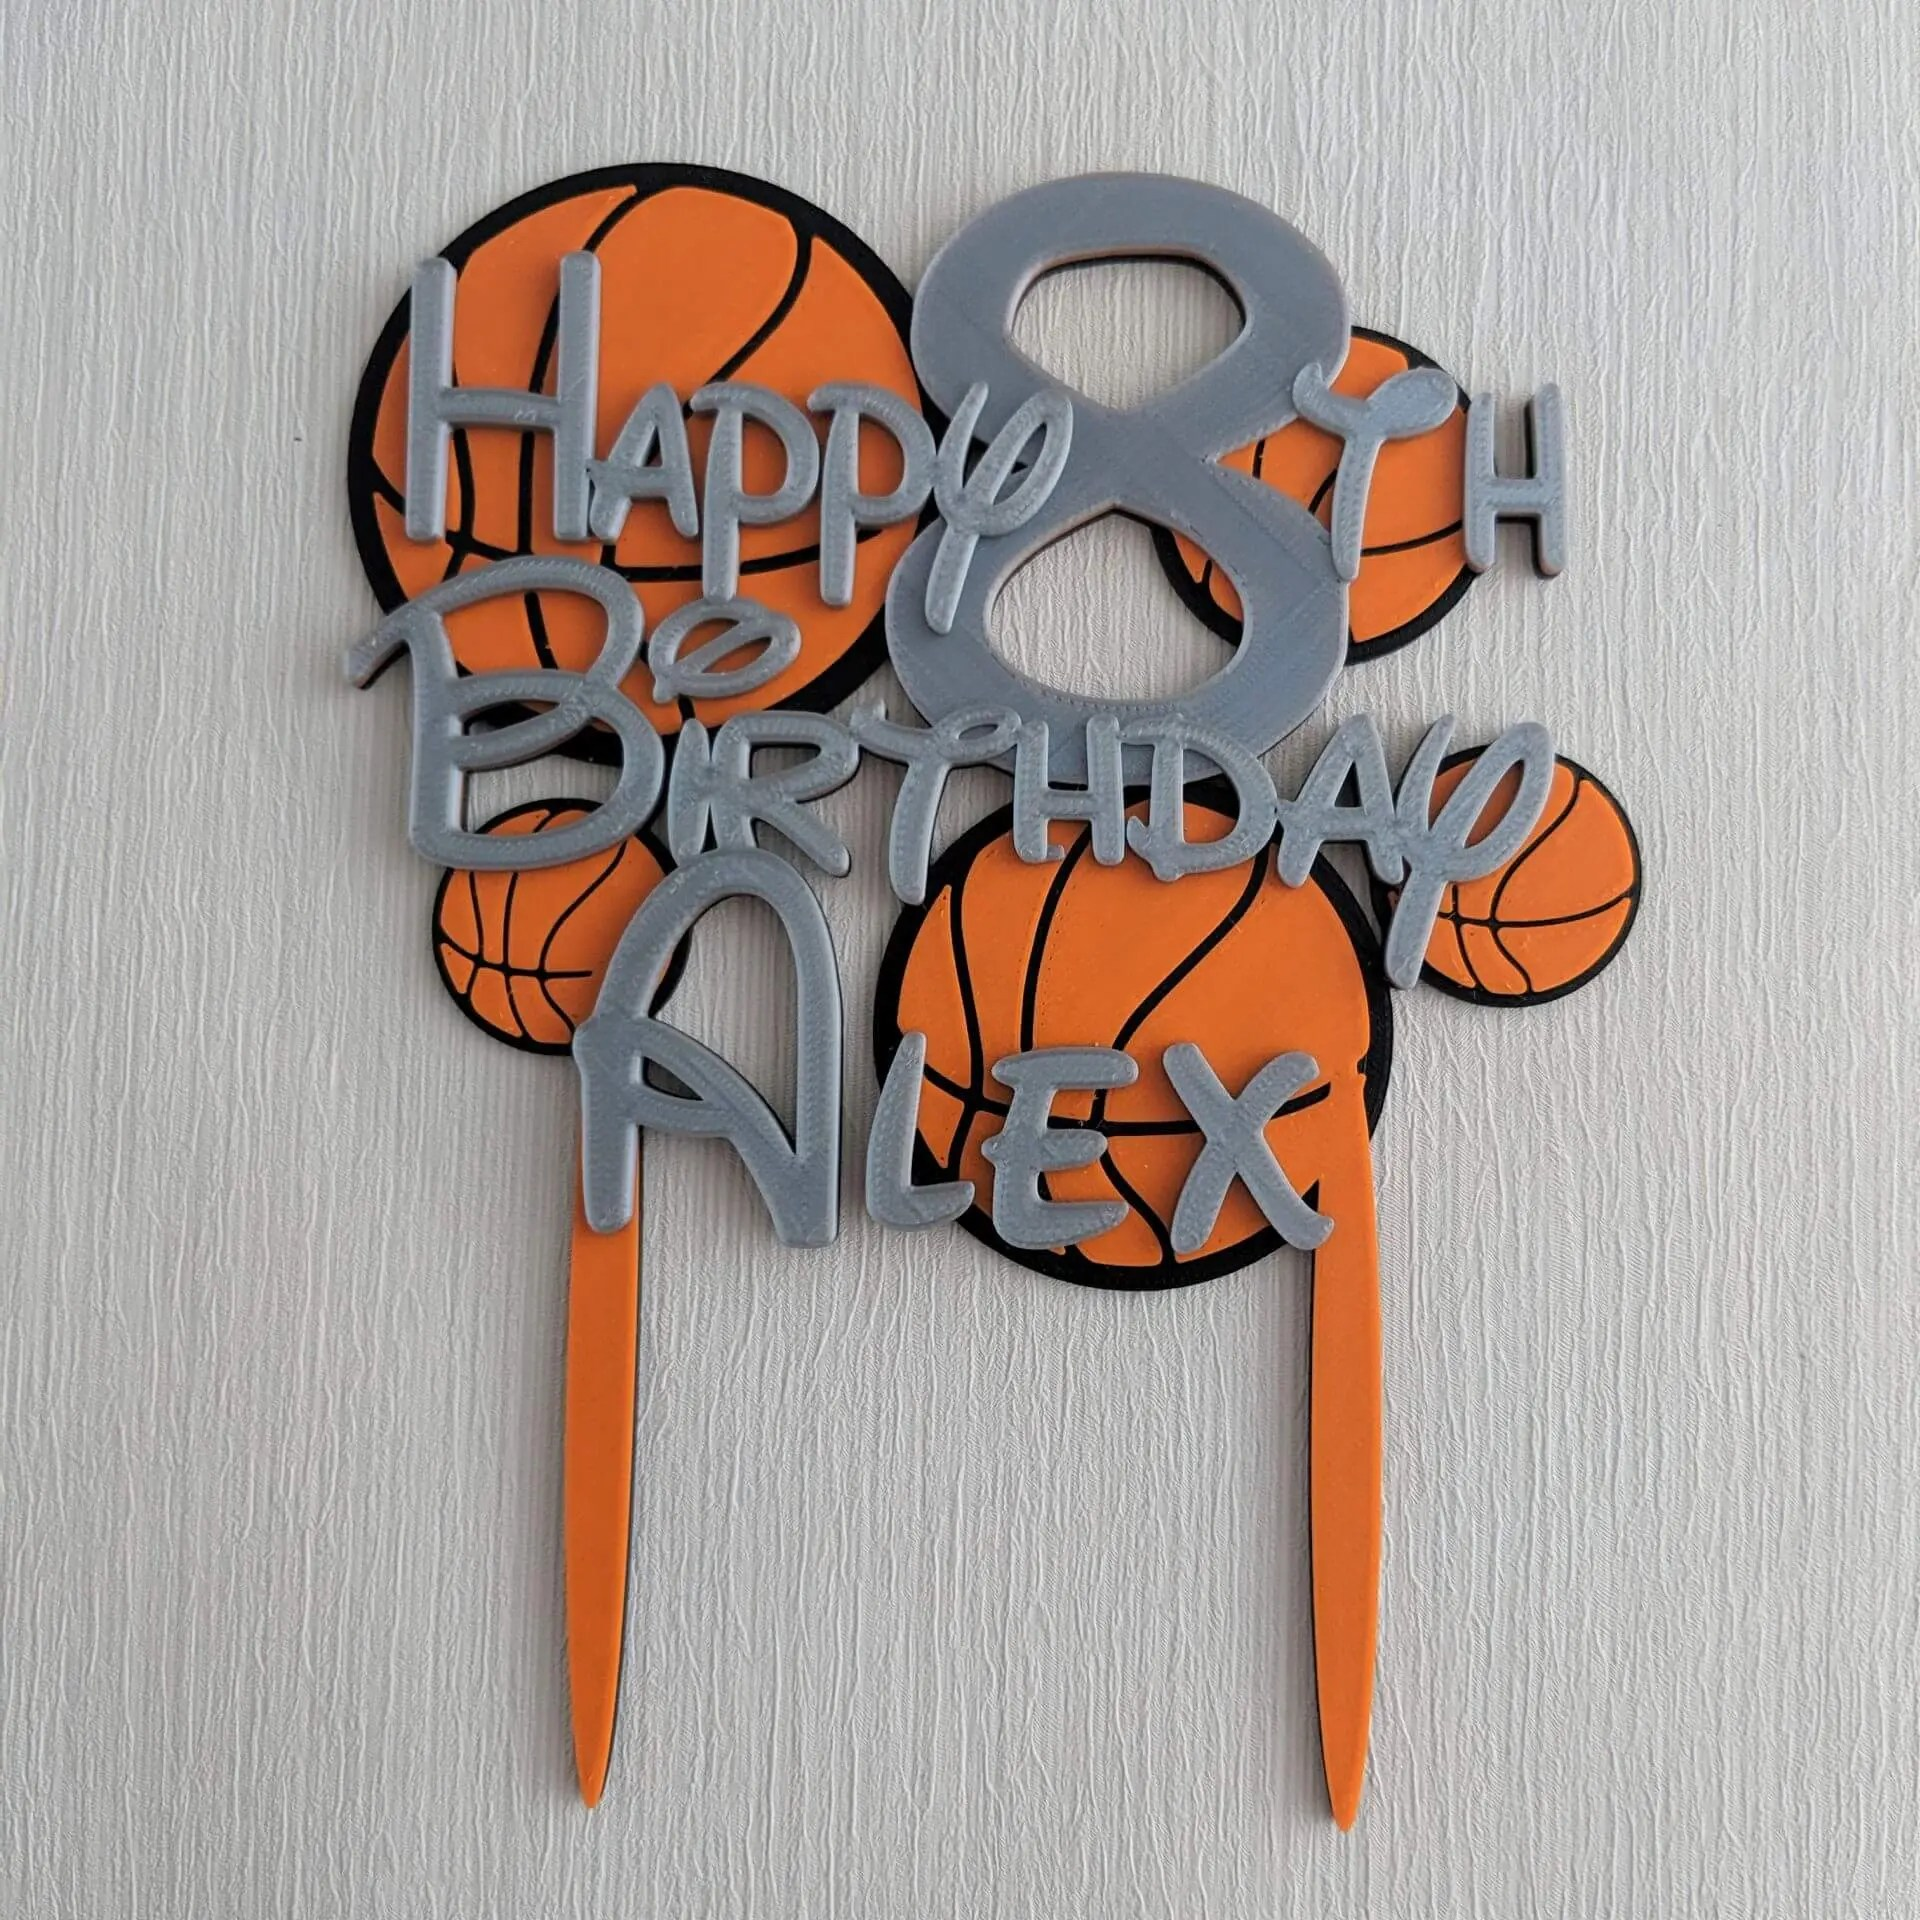 Incredible Personalised Basketball Birthday Cake Topper Dalewood Designs Gb Funny Birthday Cards Online Benoljebrpdamsfinfo